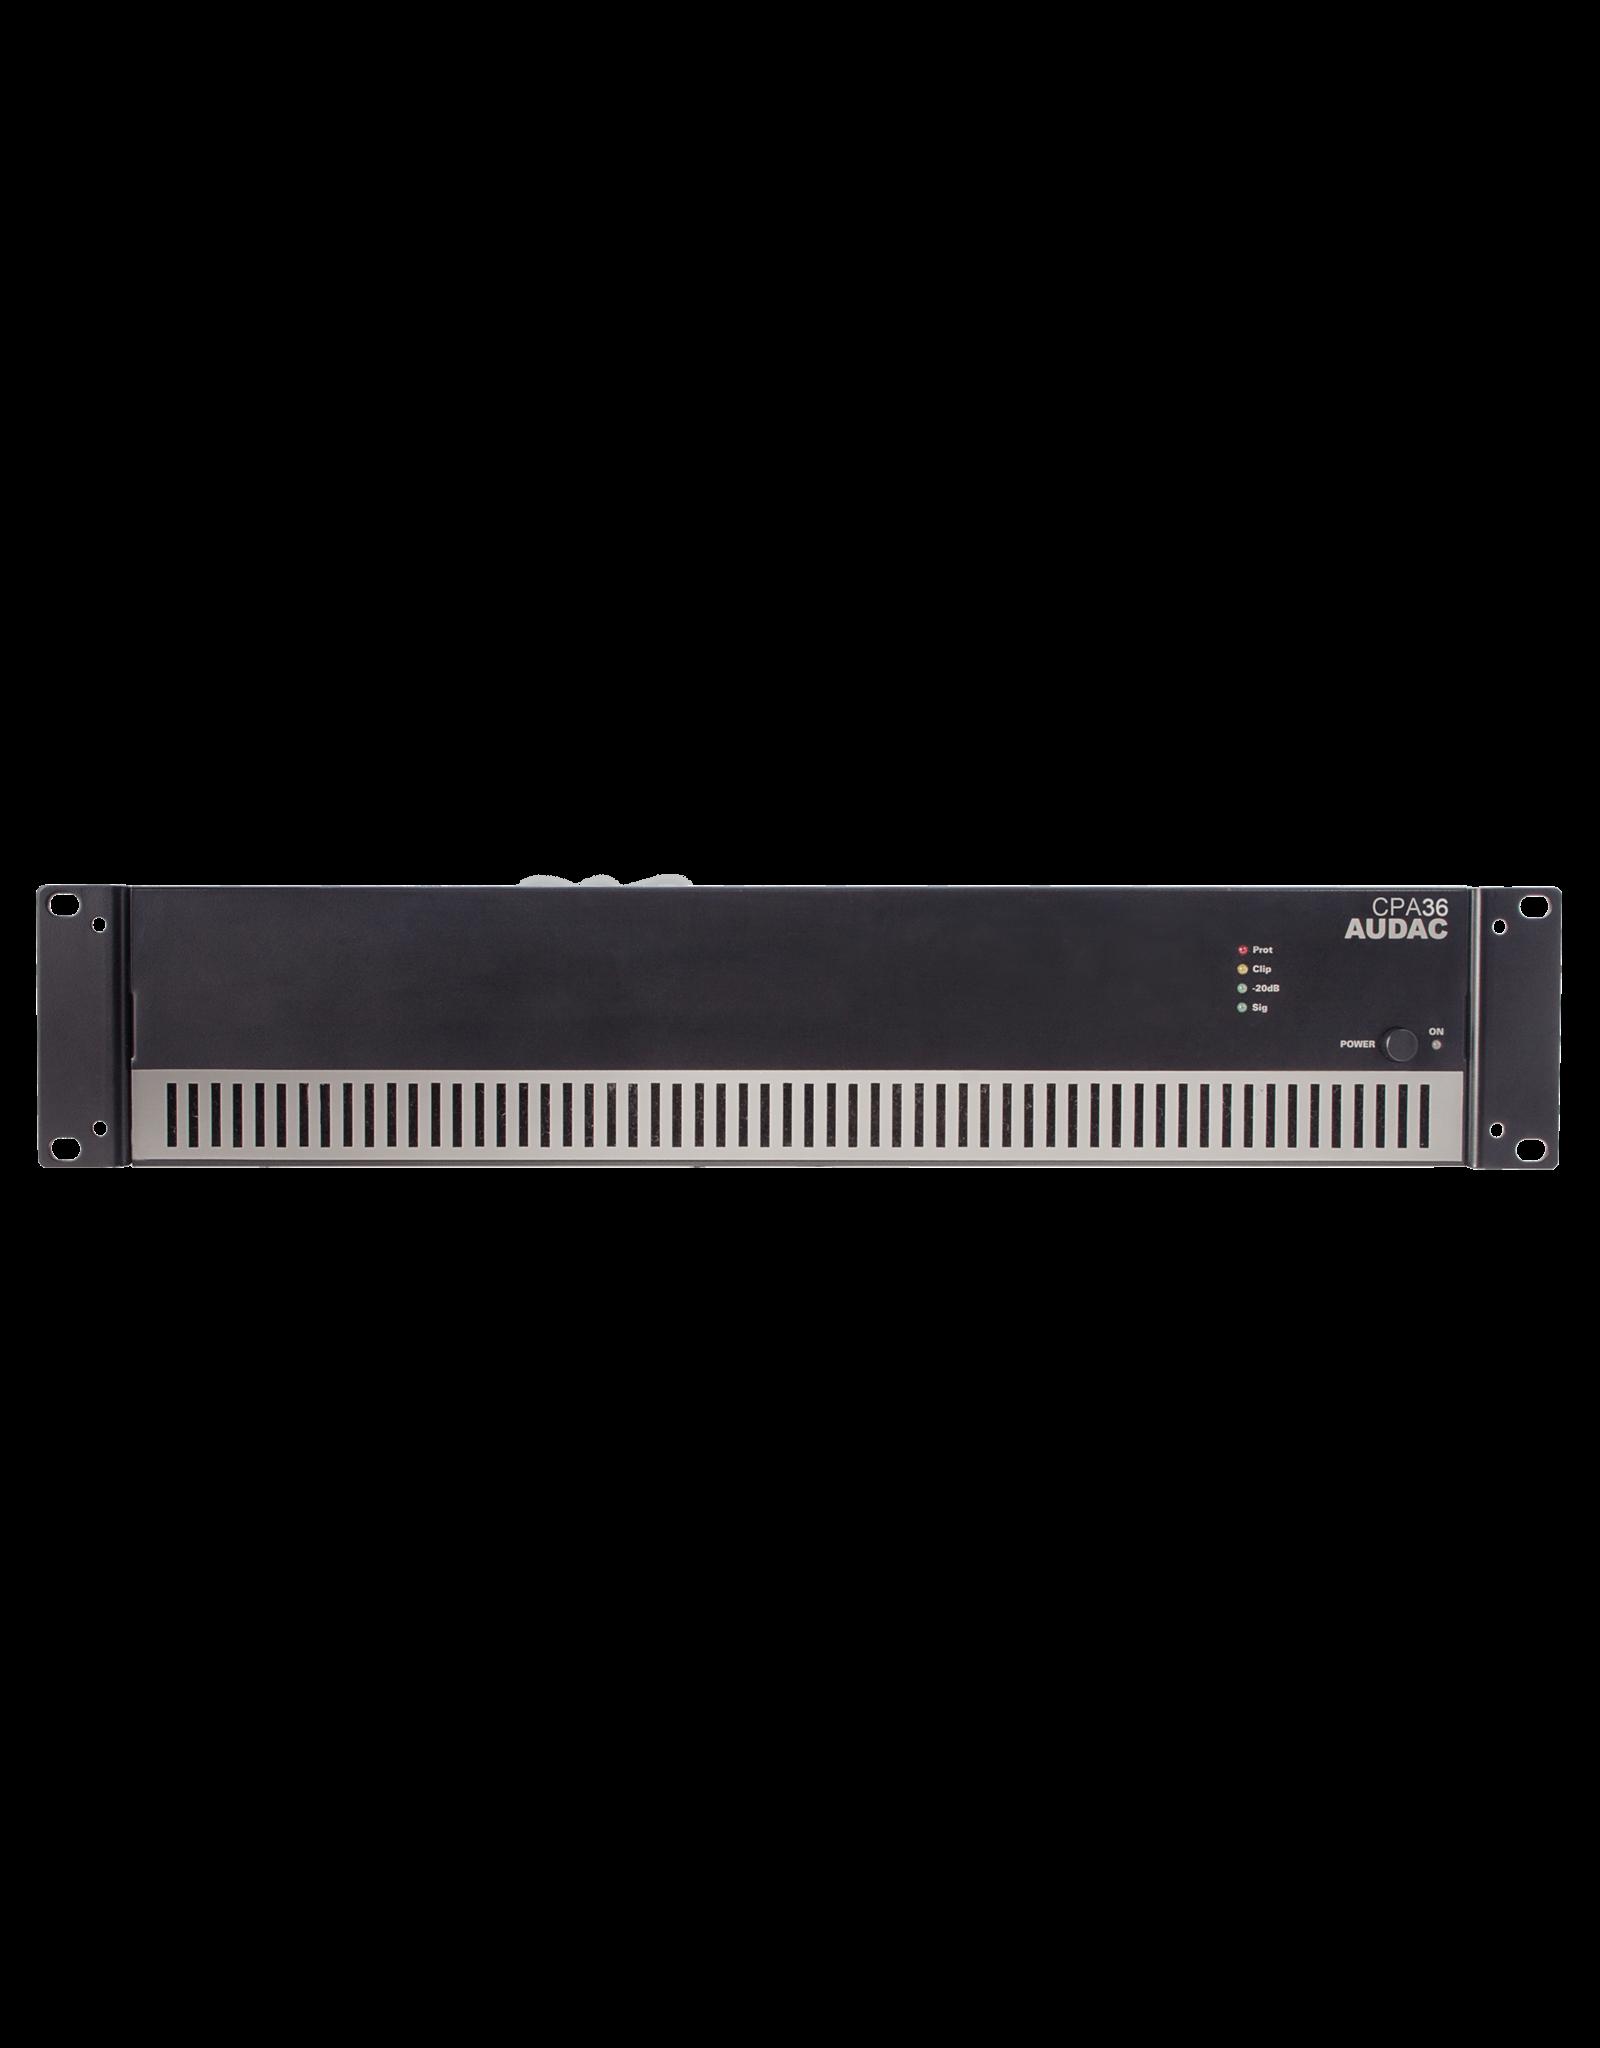 Audac Power amplifier 360W 100V